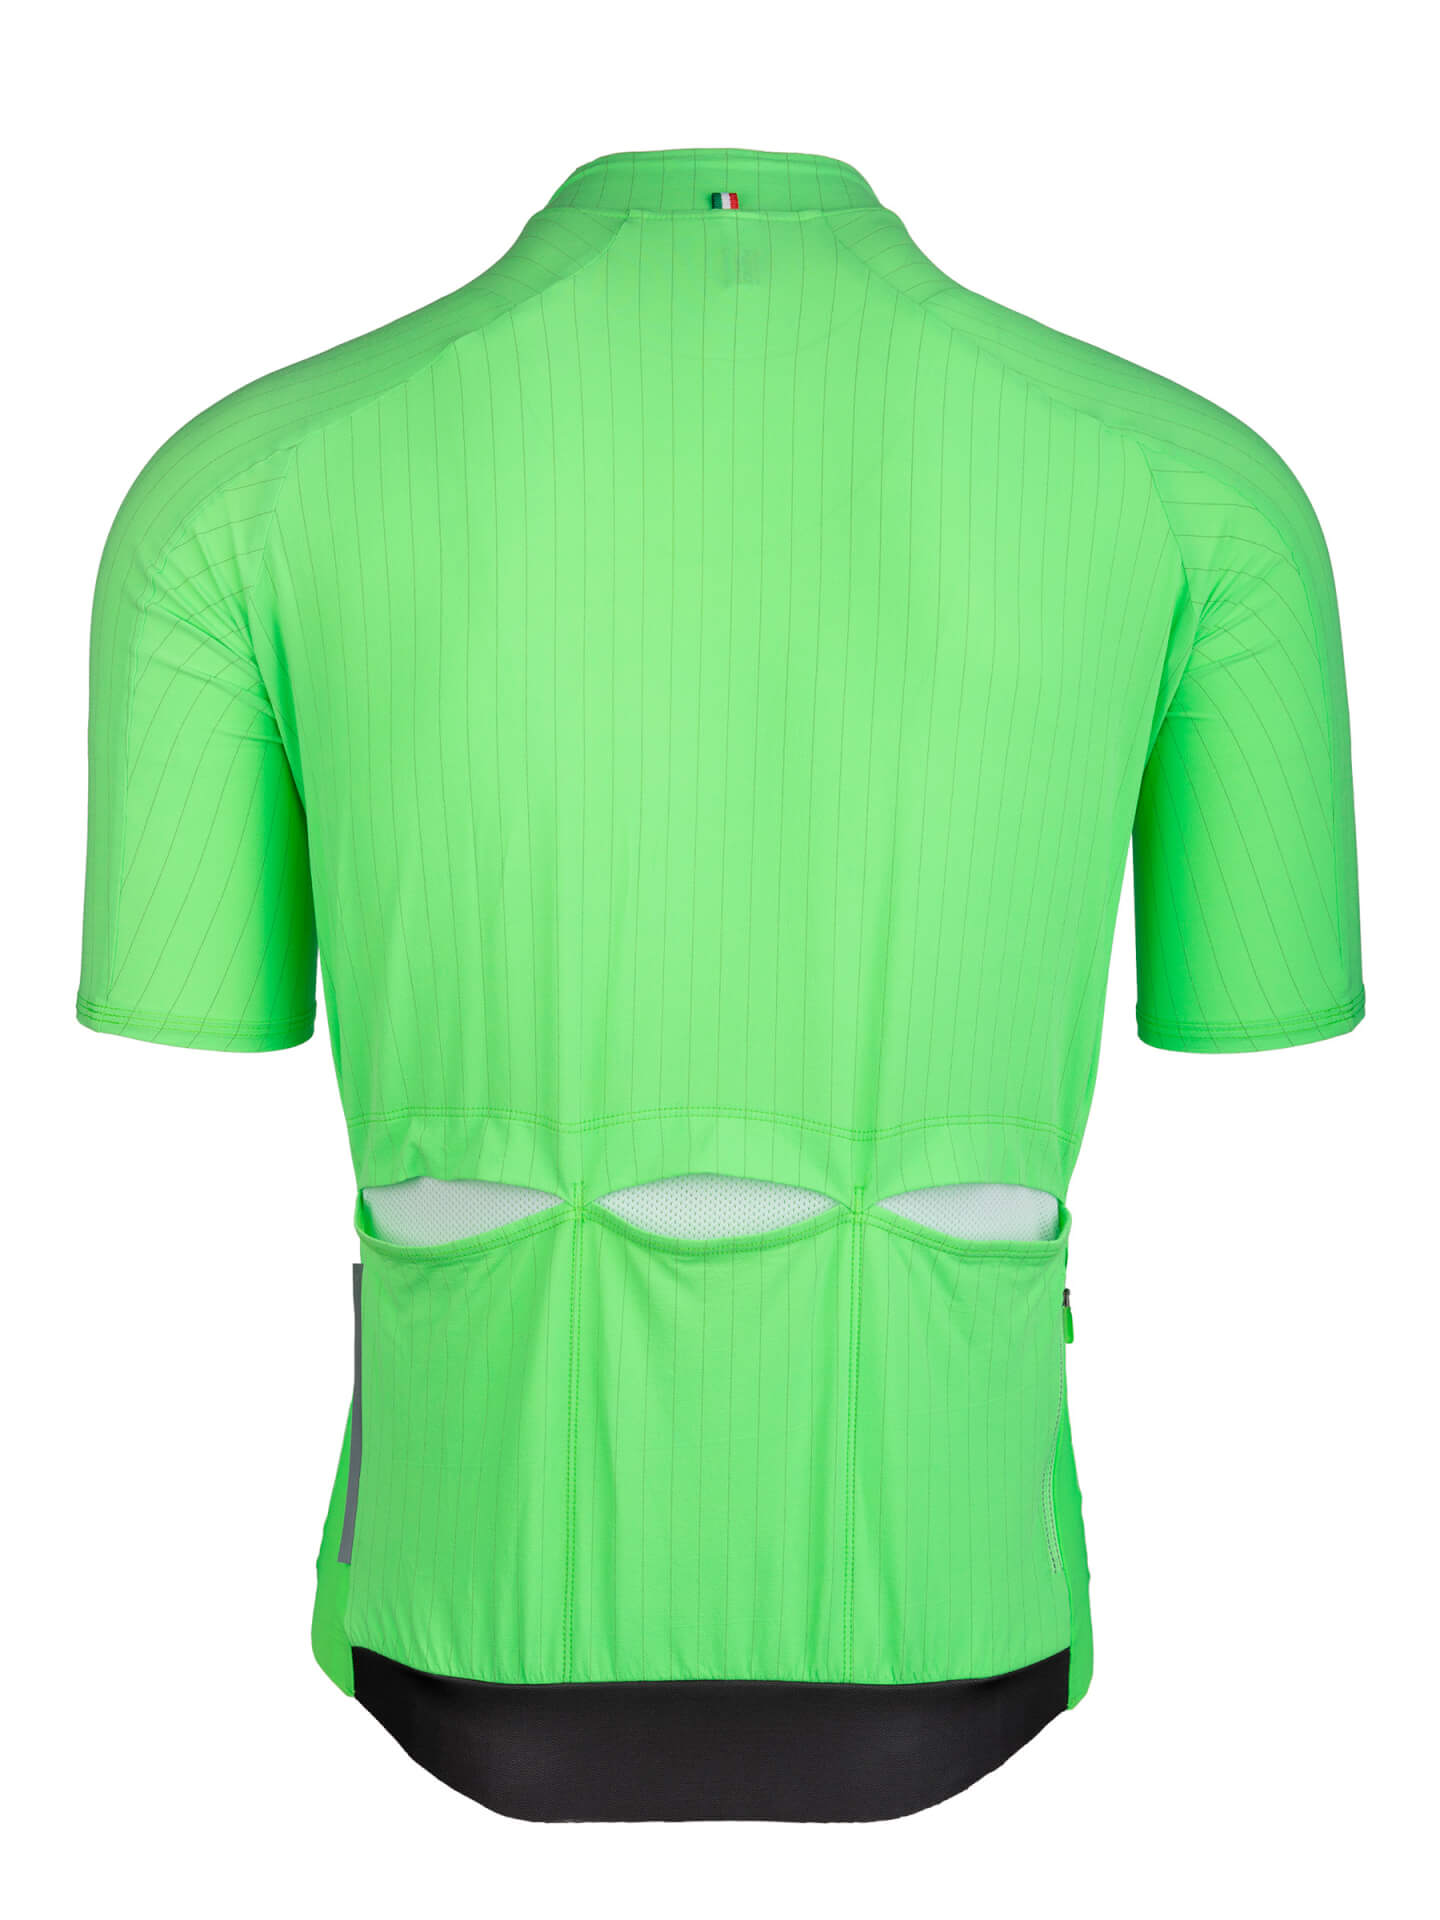 Maillot Jersey short sleeve Seta Verde